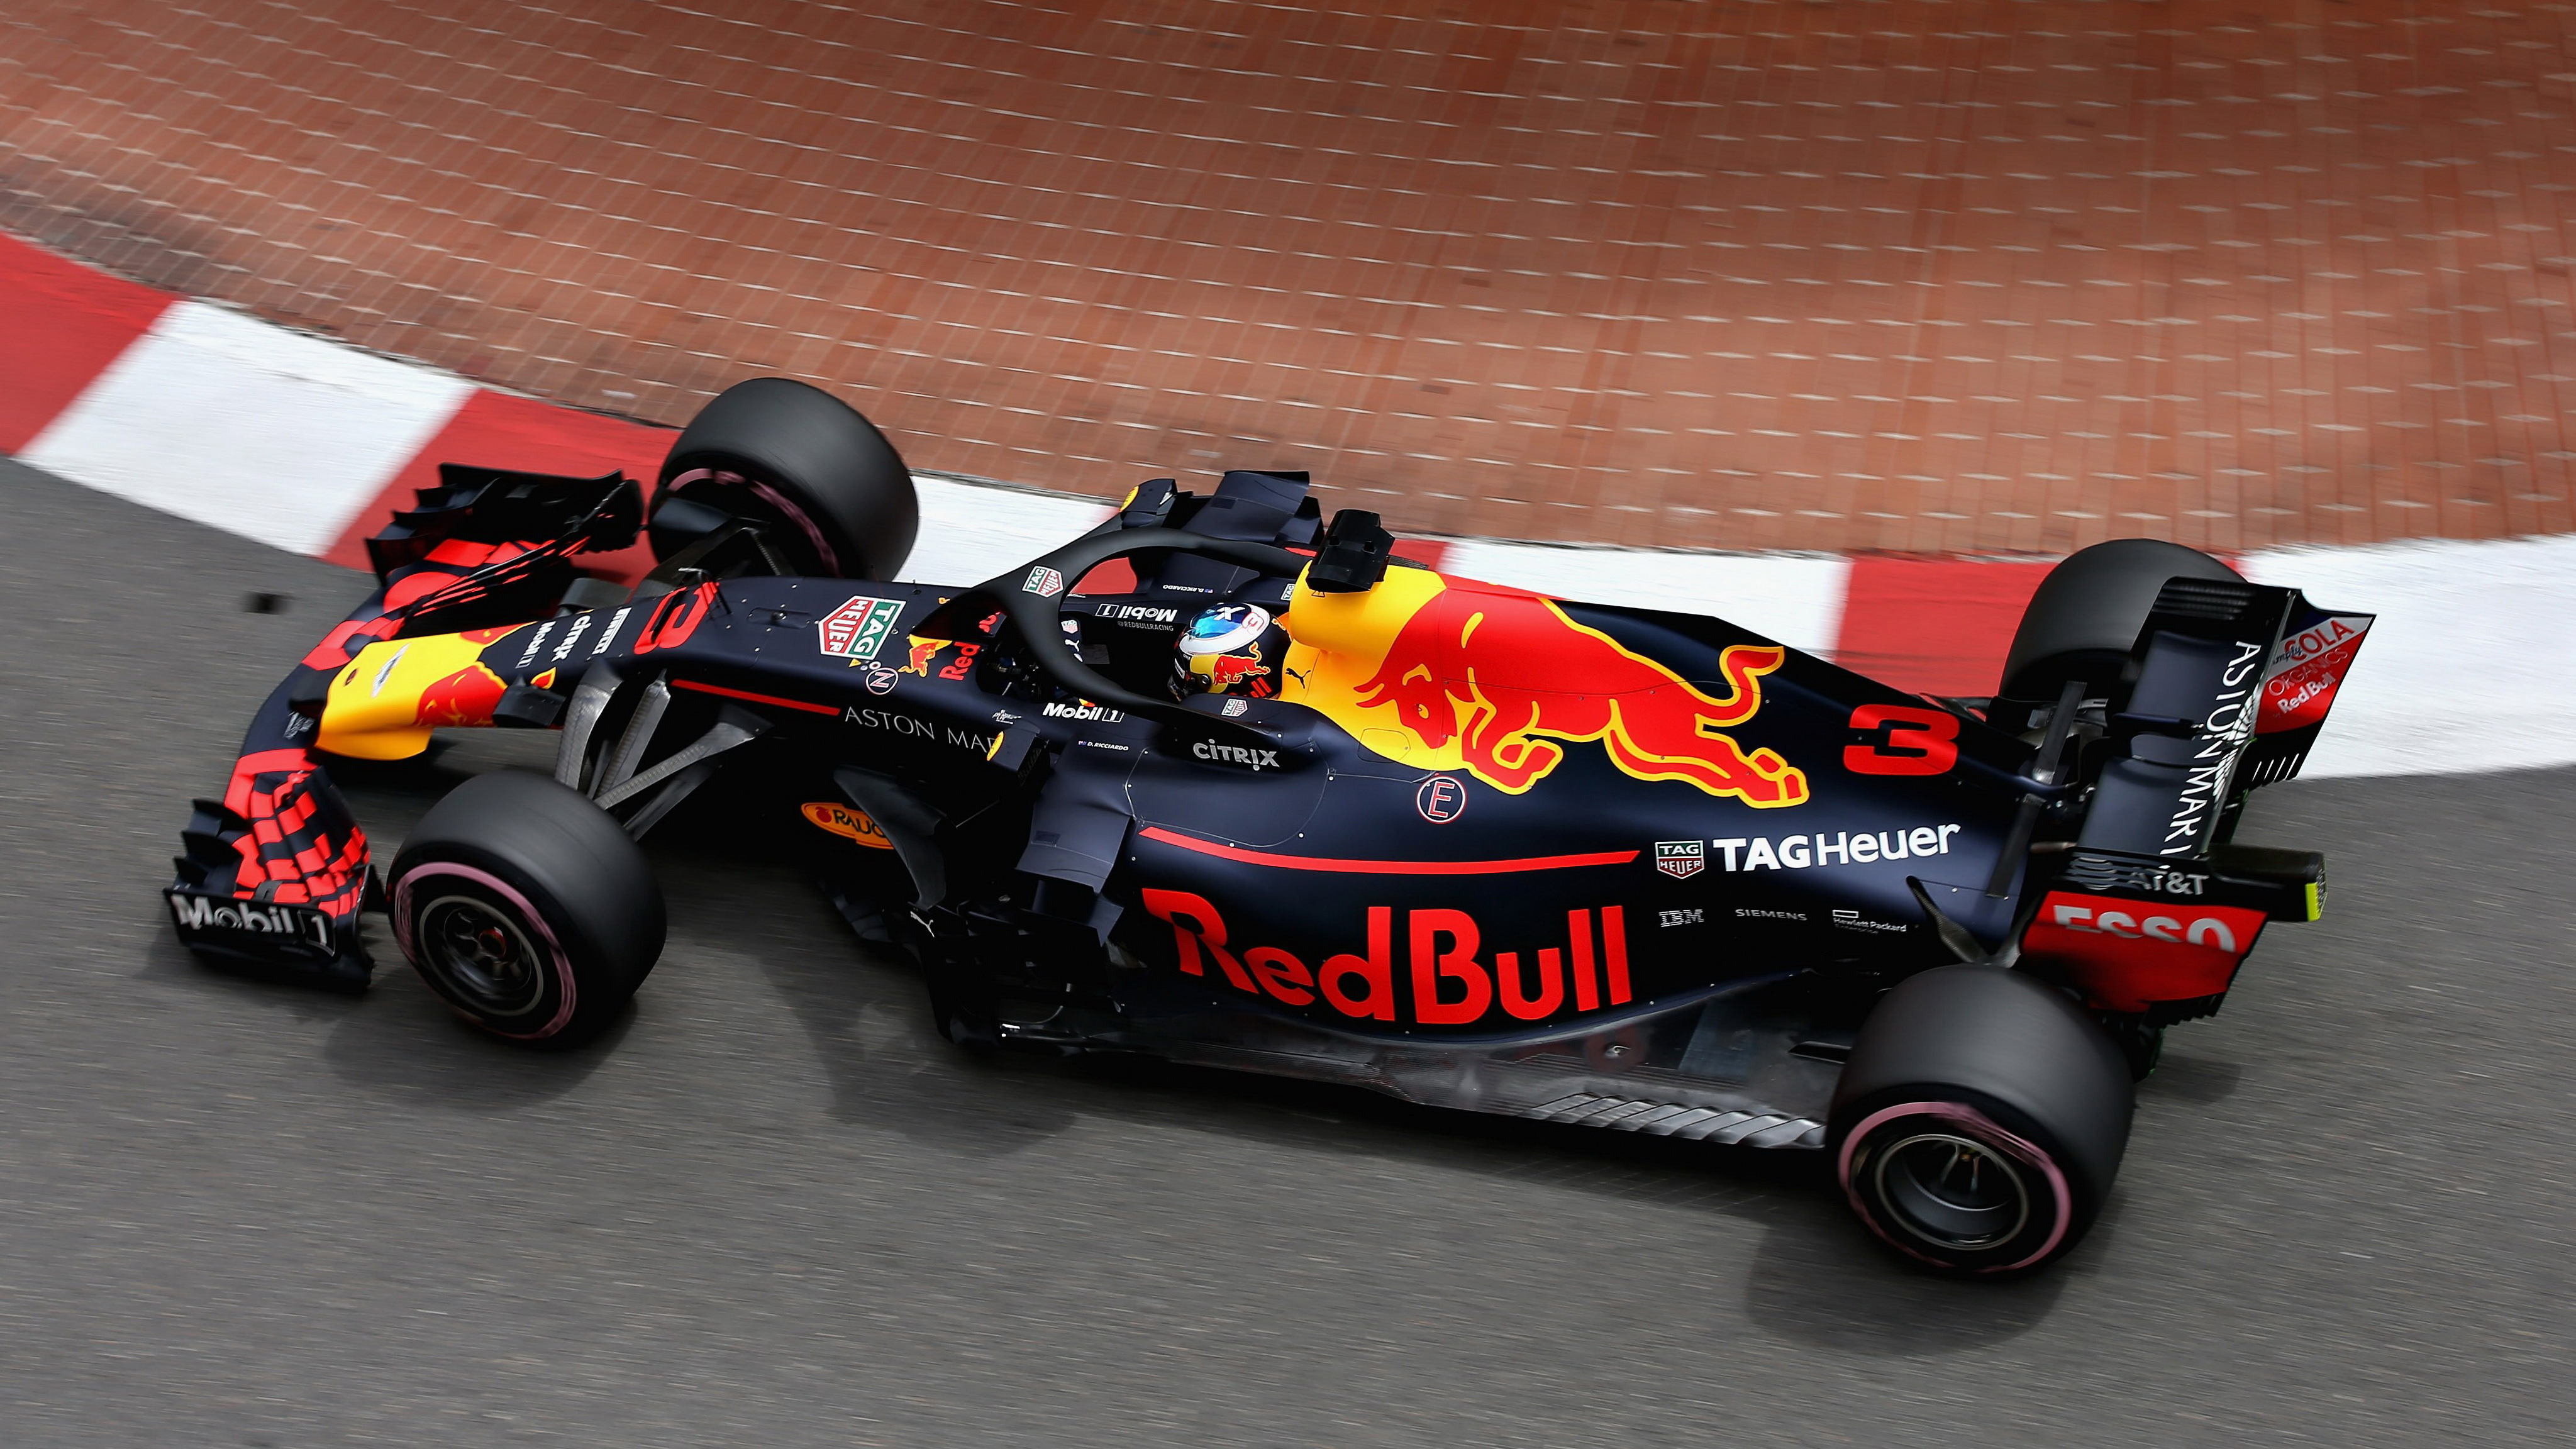 Red Bull Racing Rb14 4096x2304 Wallpaper Teahub Io